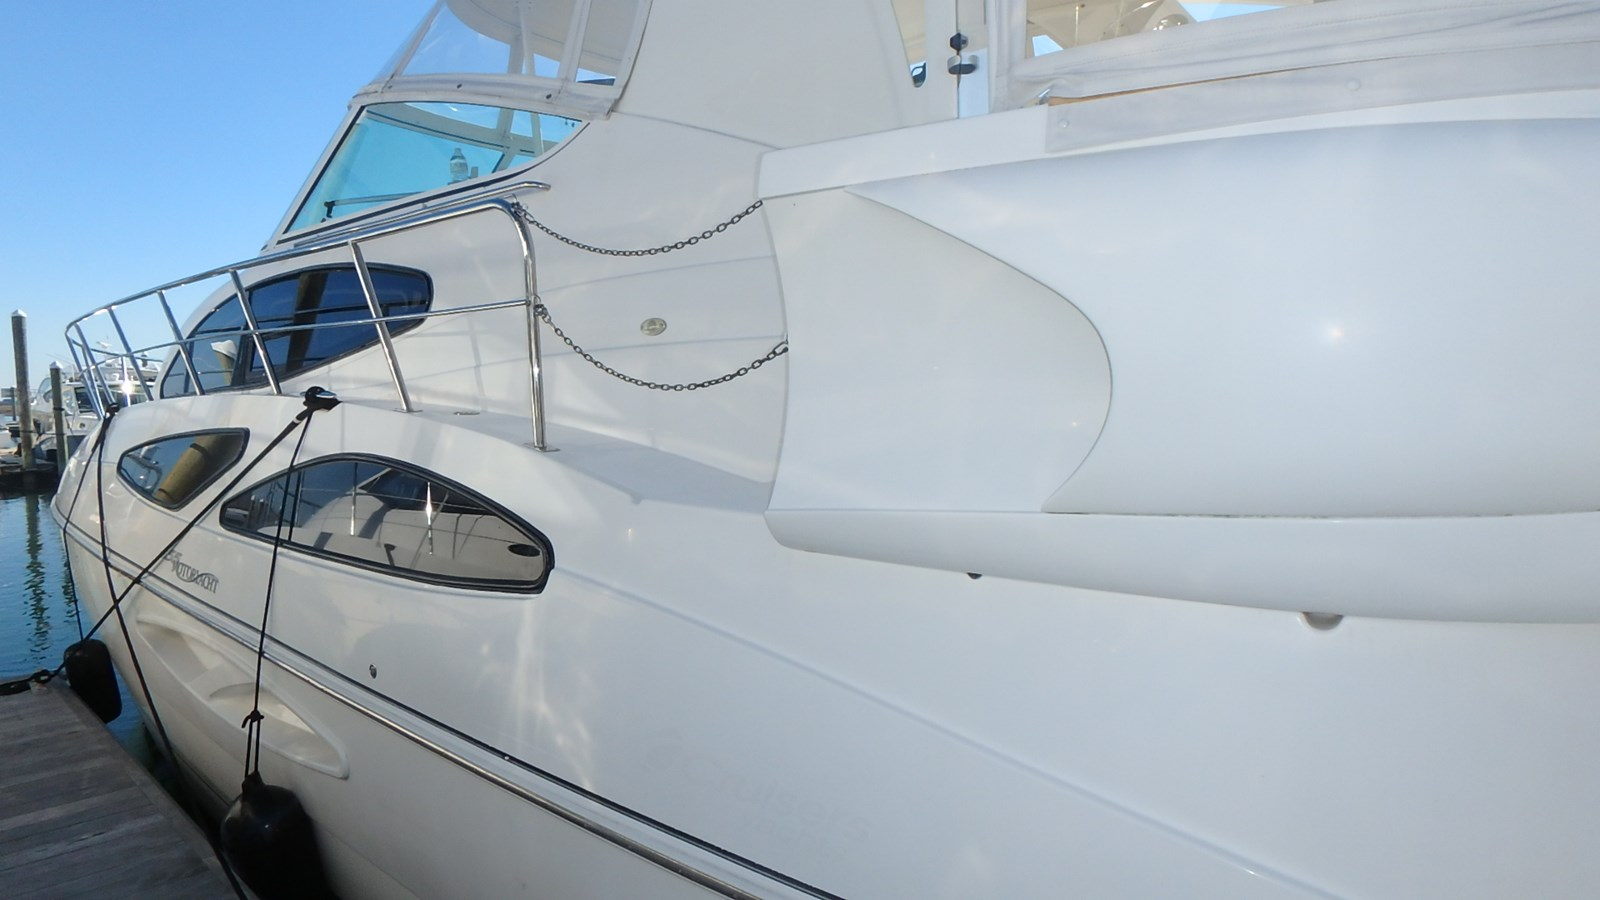 P1160913 2005 CRUISERS YACHTS 455 Express Motoryacht Motor Yacht 2522201